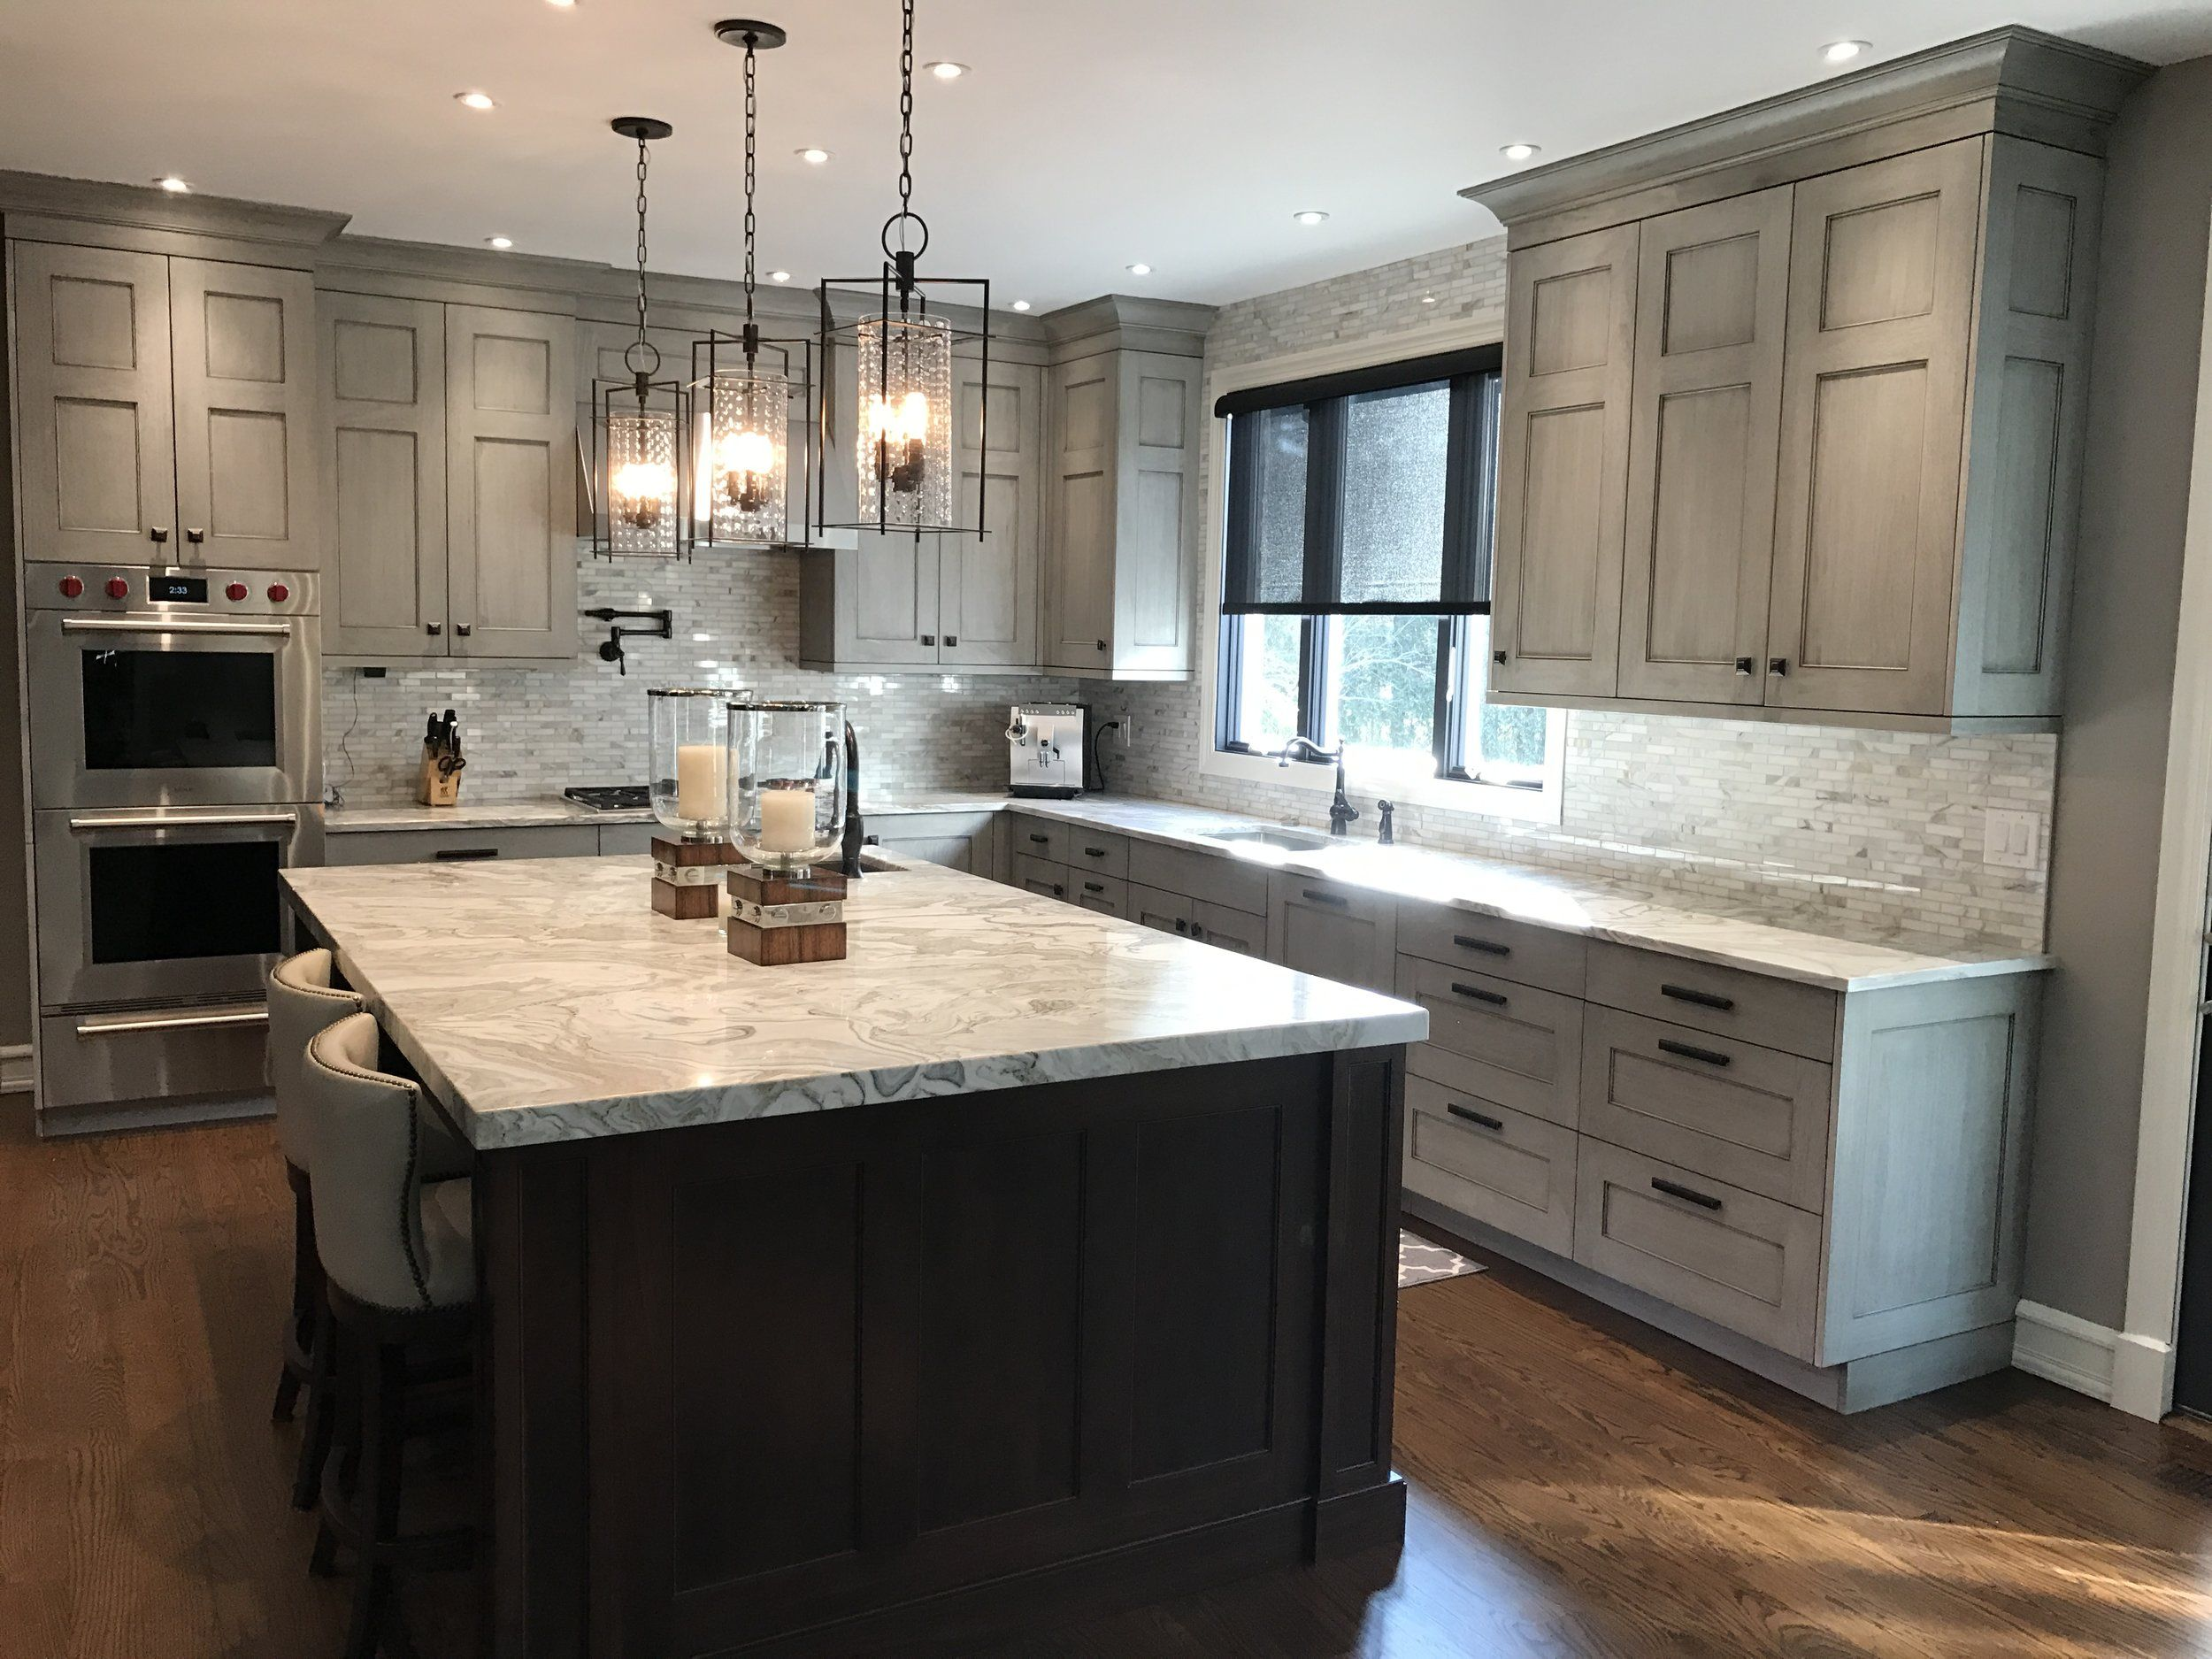 Kitchen Bath Home Design And Remodel Center Elite Kitchen Bath Express Contracting Serving Long Island In 2020 Kitchen Design Kitchen Remodel Cabinetry Design